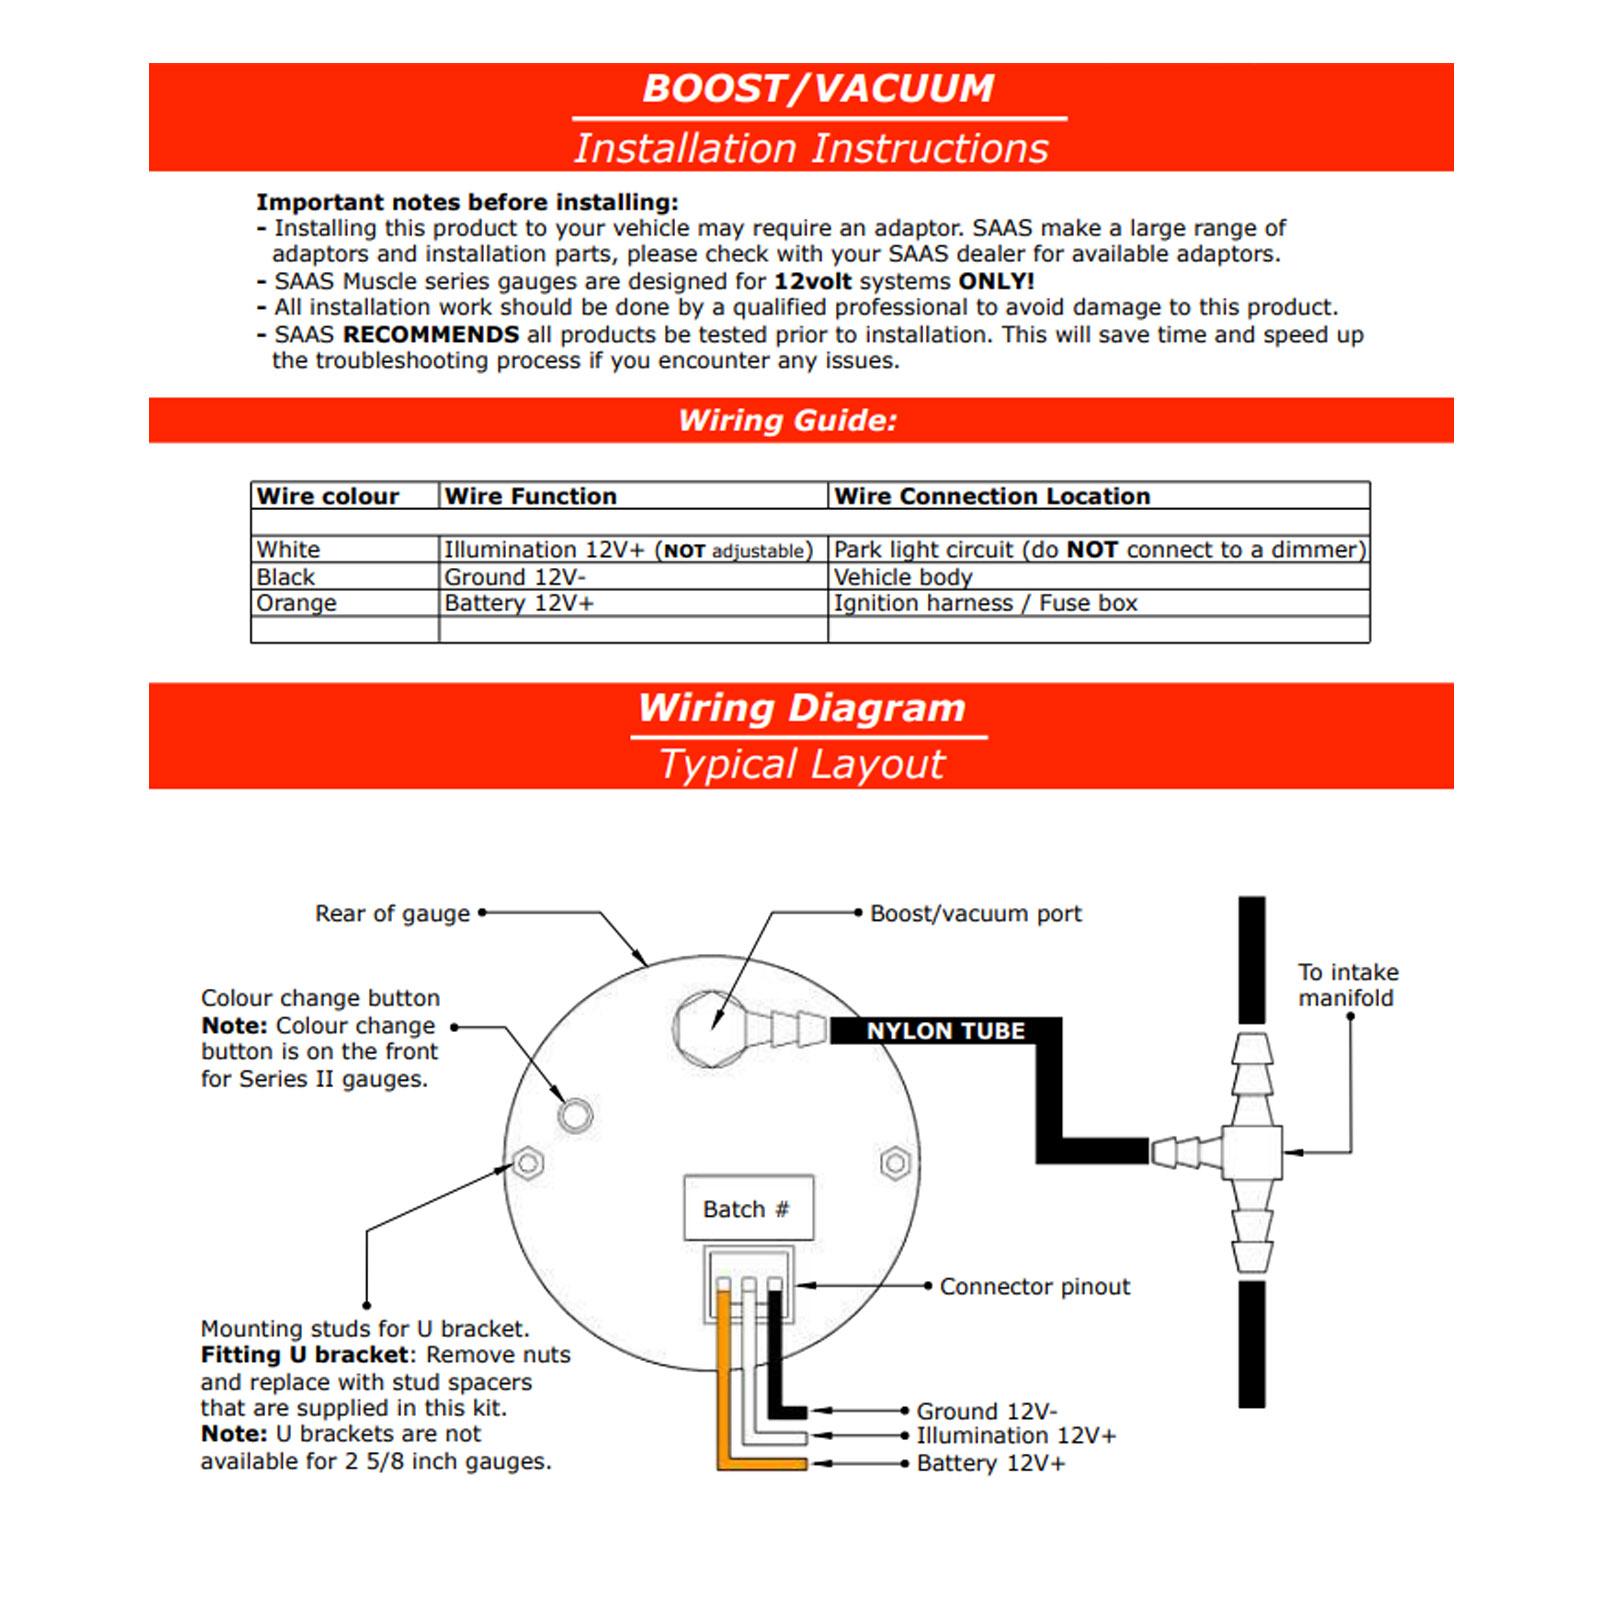 Dolphin Quad Gauges 7600 Wiring Diagram - Strat Wiring Diagram Bridge Tone  - ace-wiring.pas-sayange.jeanjaures37.frWiring Diagram Resource